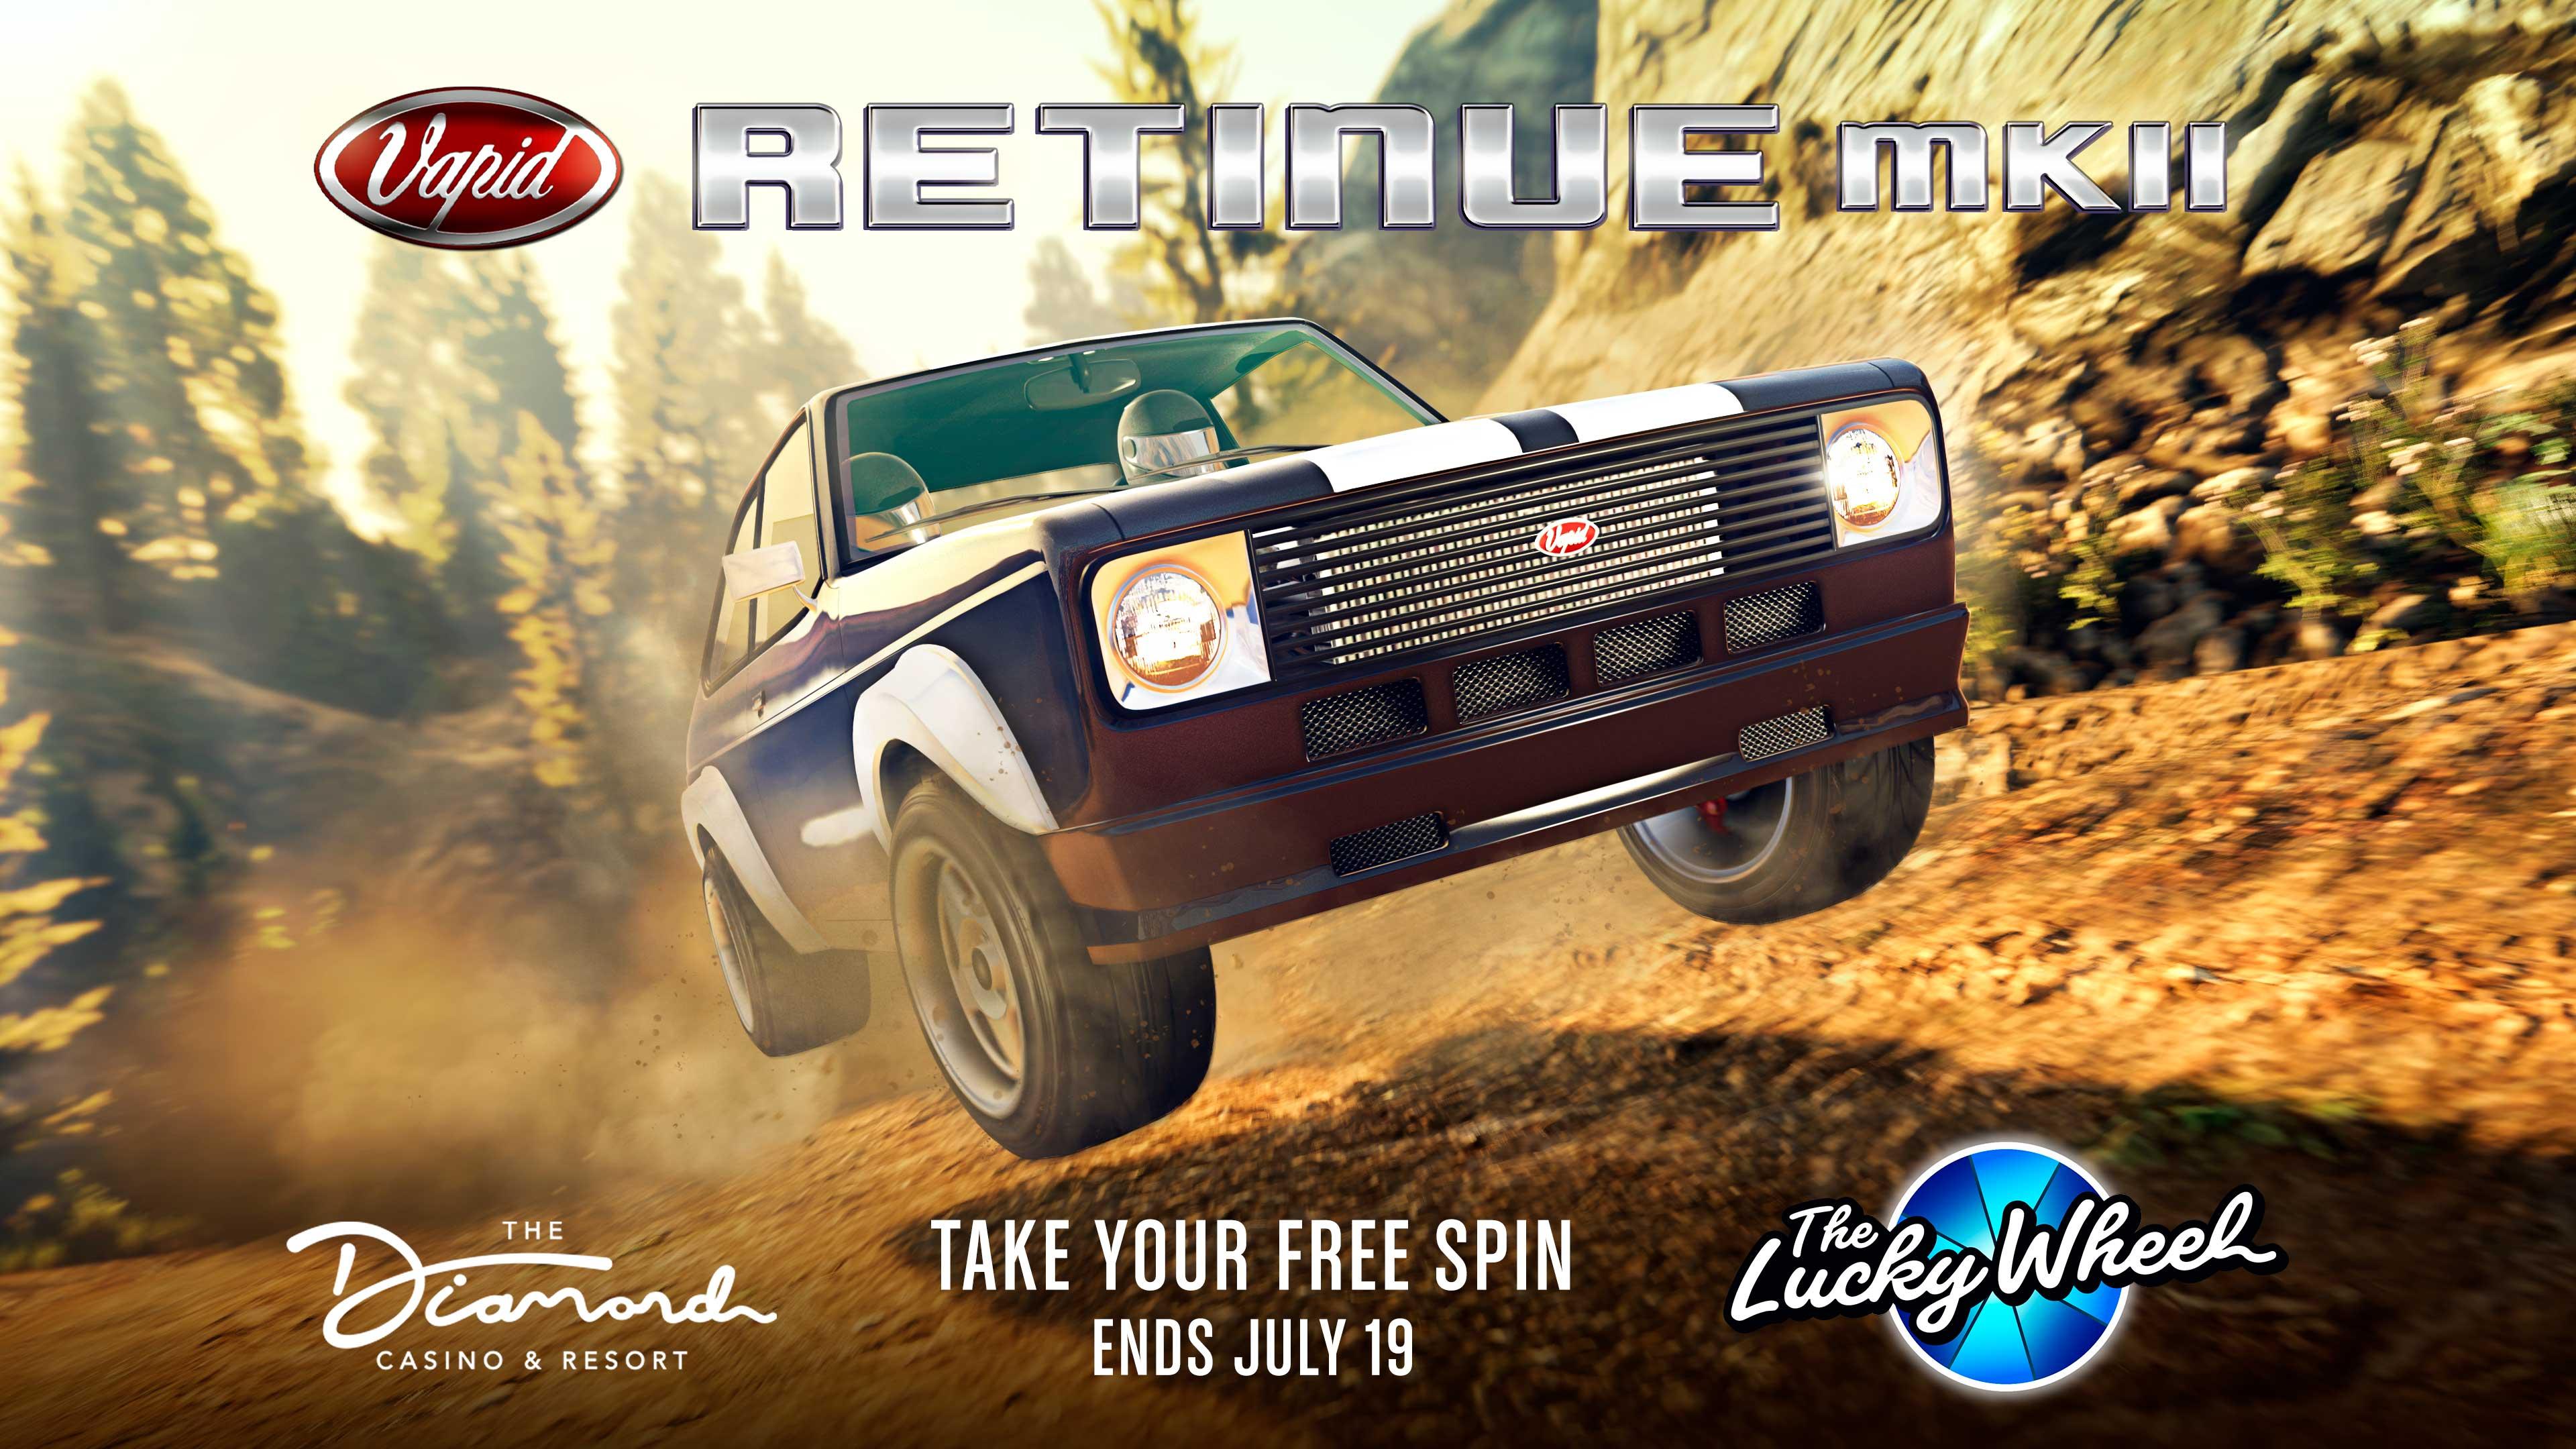 GTA Online Podium Lucky Wheel kocsi: Vapid Retinue Mk II